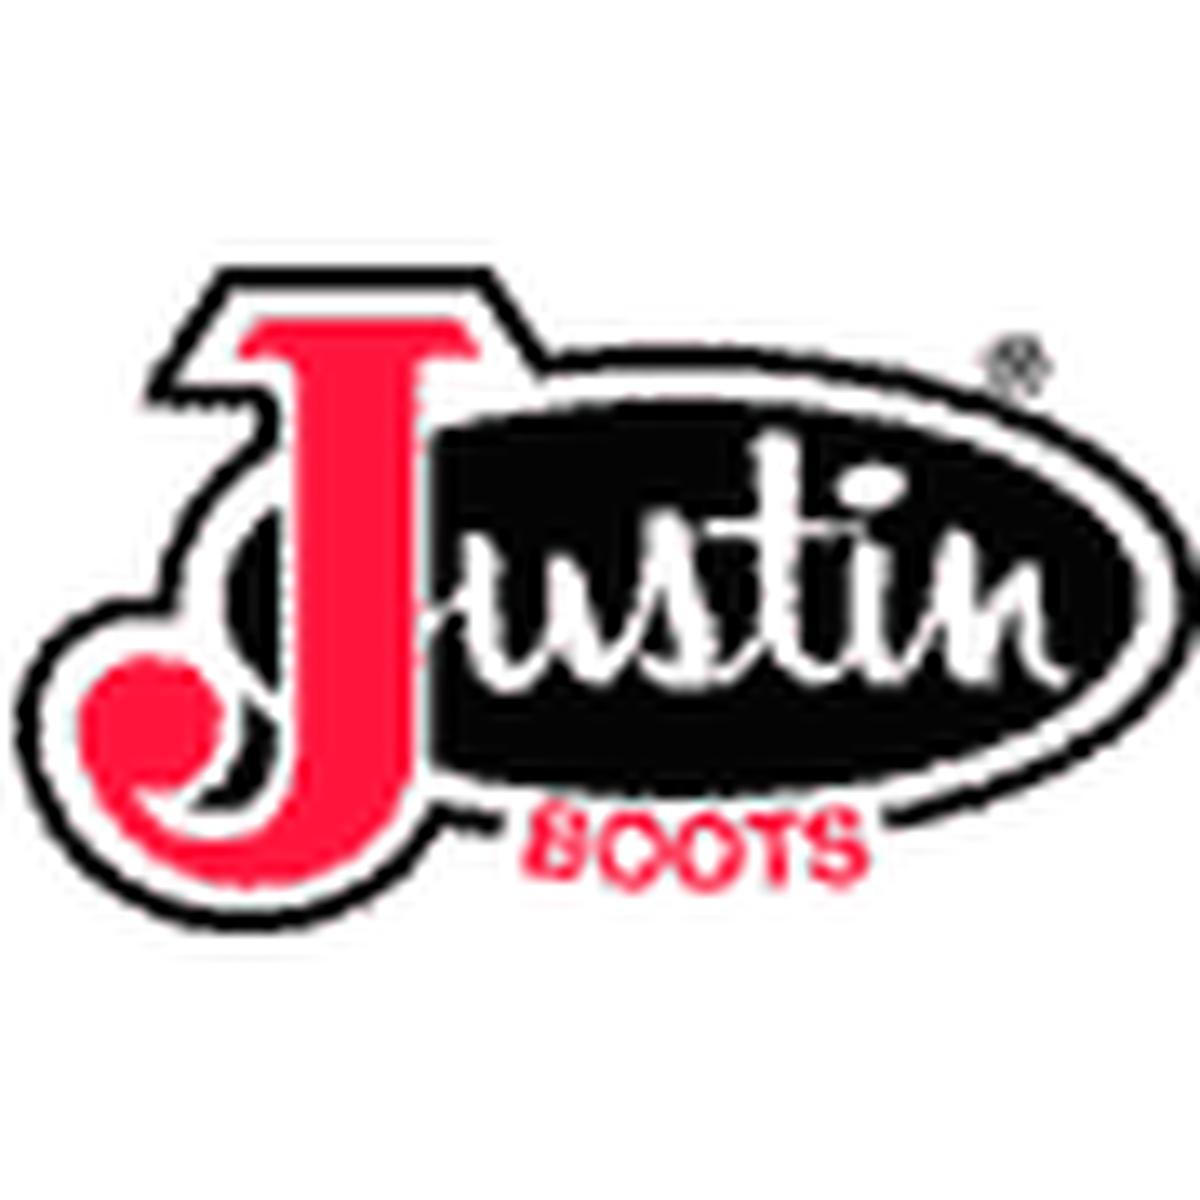 Justin Original Work Boots